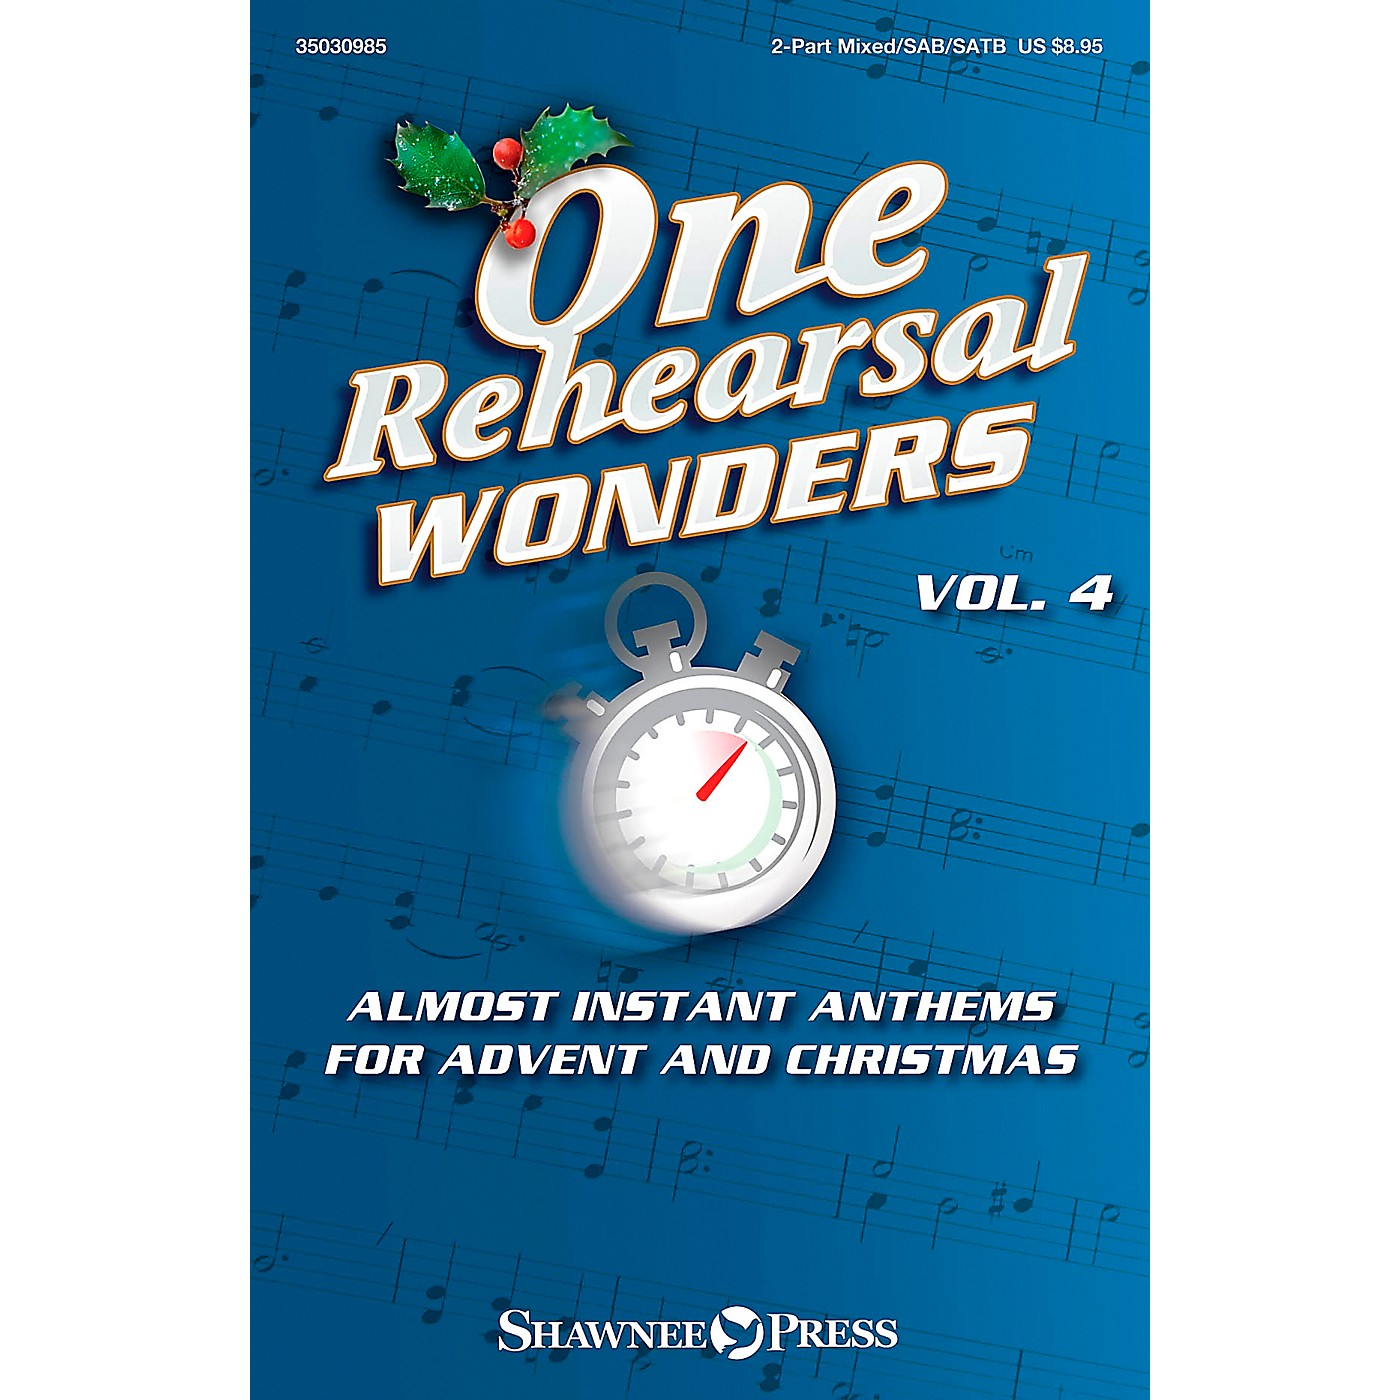 Shawnee Press One Rehearsal Wonders, Vol. 4 - Advent and Christmas 2PT/SAB/SATB arranged by Various thumbnail